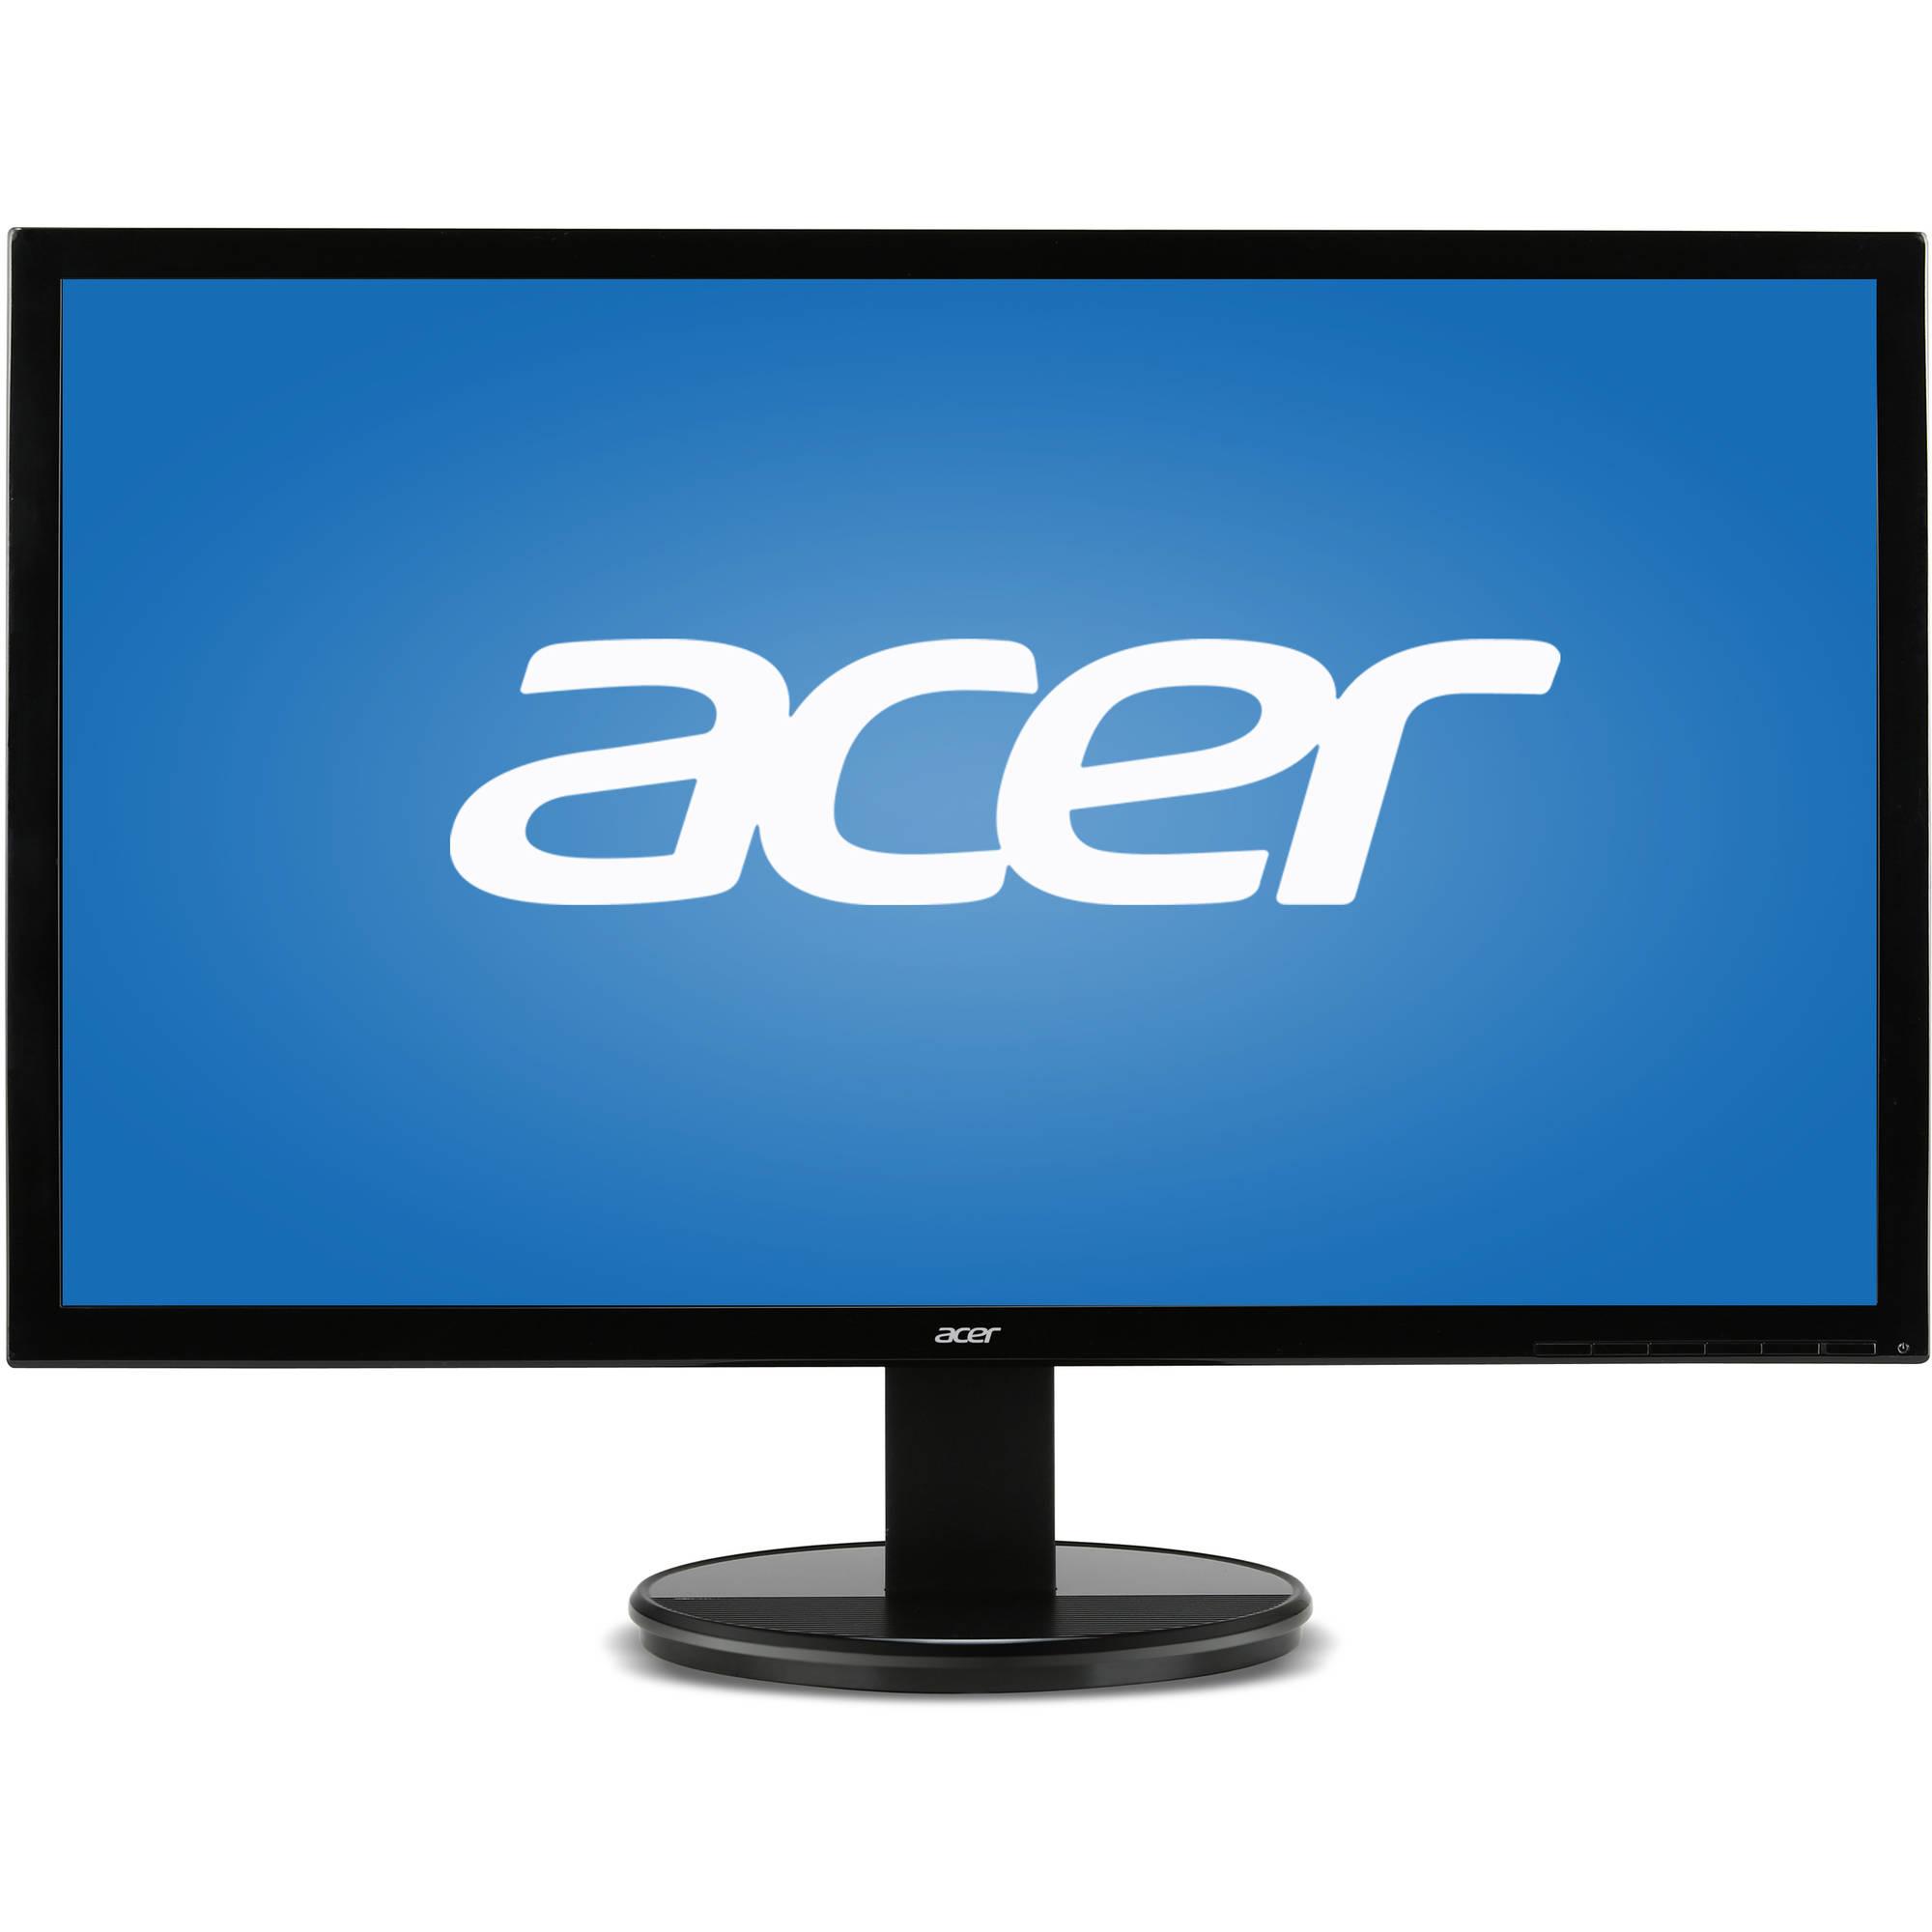 "Acer K202HQL 19.5"" Monitor - $19 YMMV"